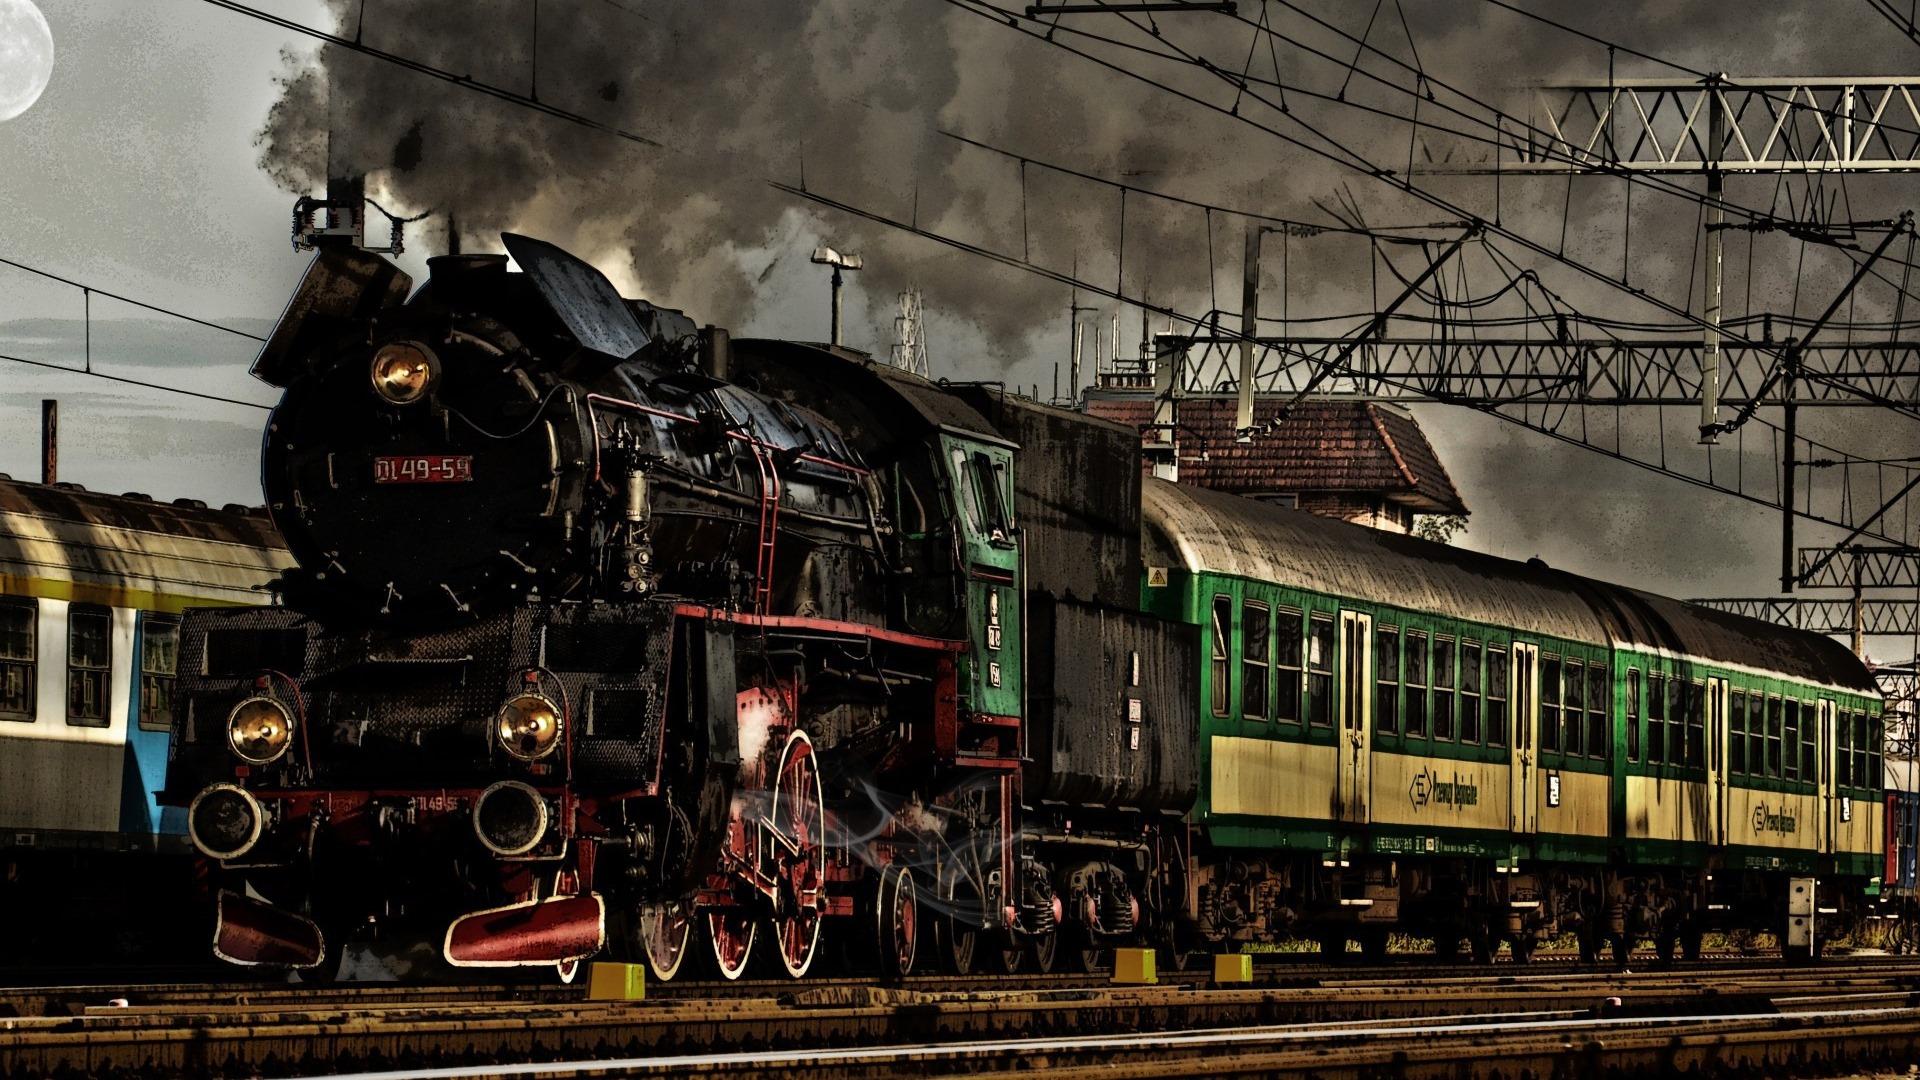 locomotive wallpaper desktop 1920 x wallpapersafari